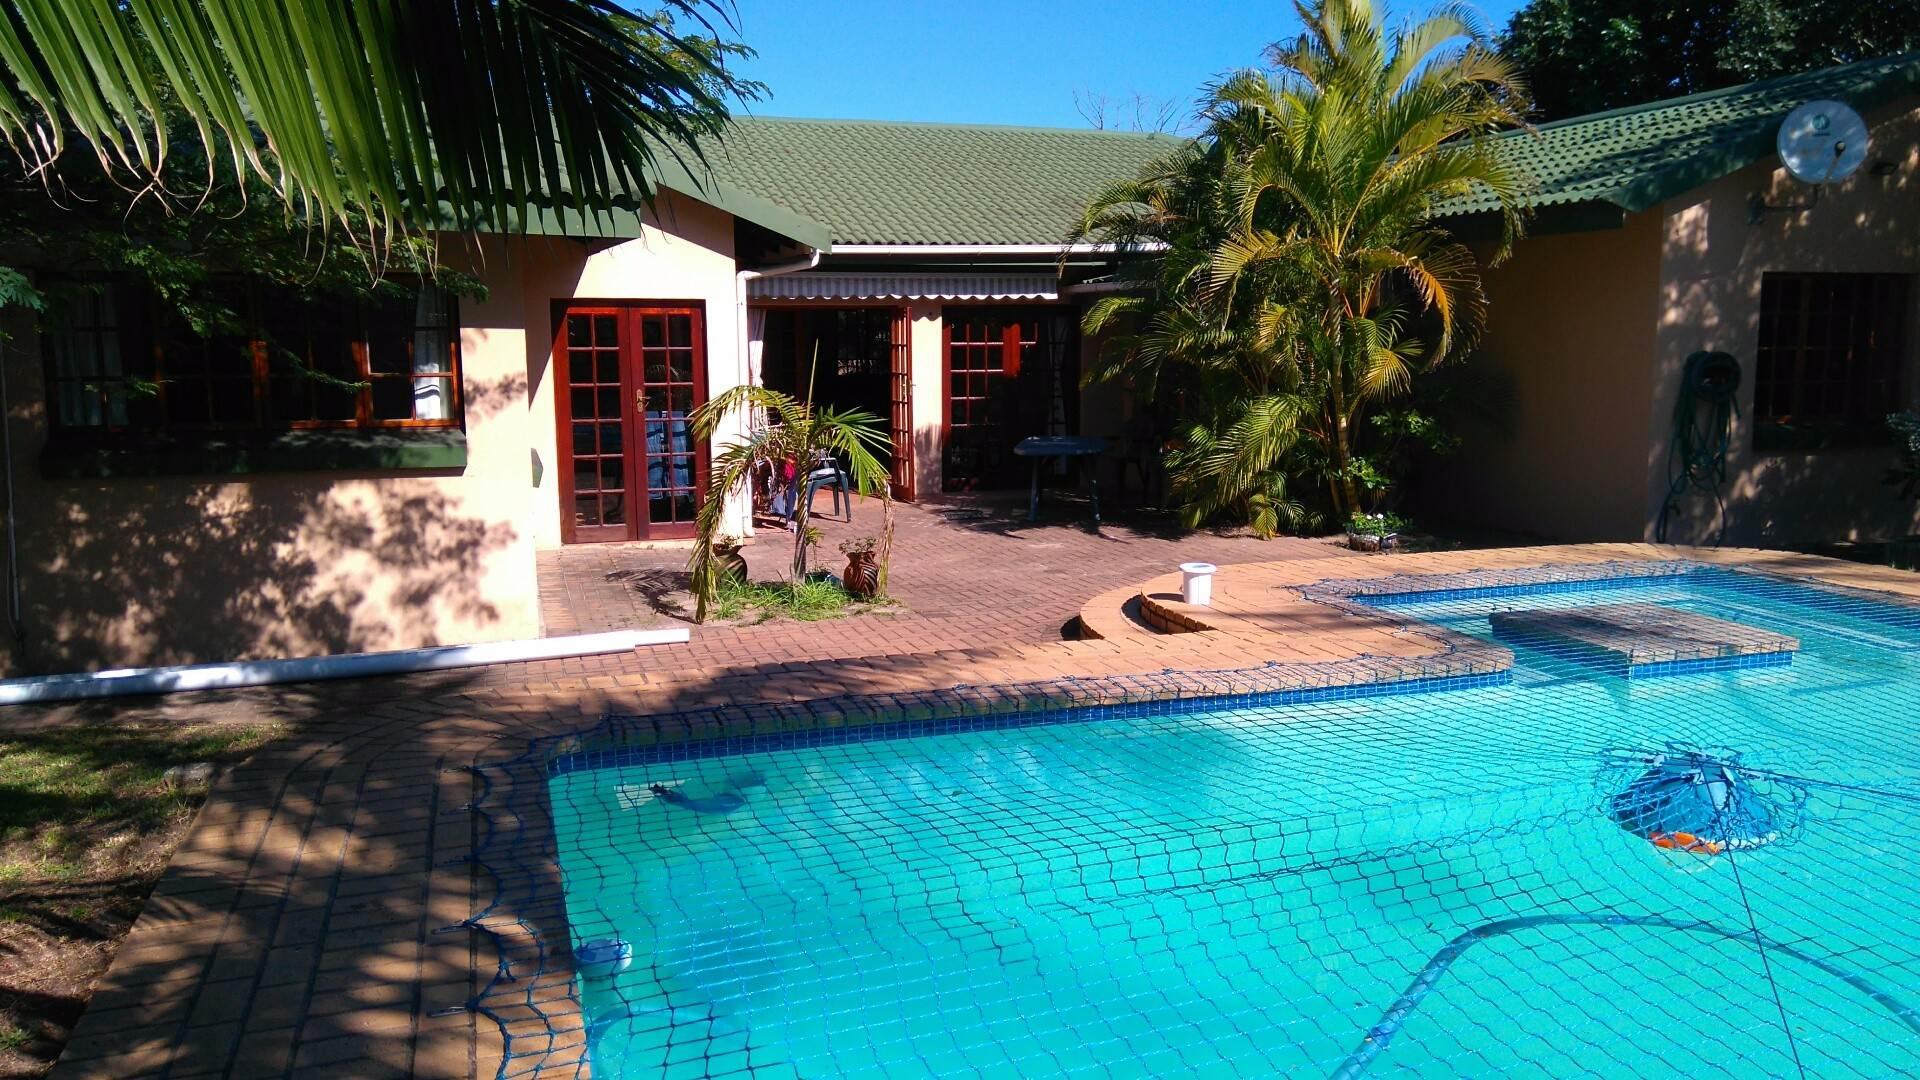 4 BedroomHouse To Rent In Birdswood